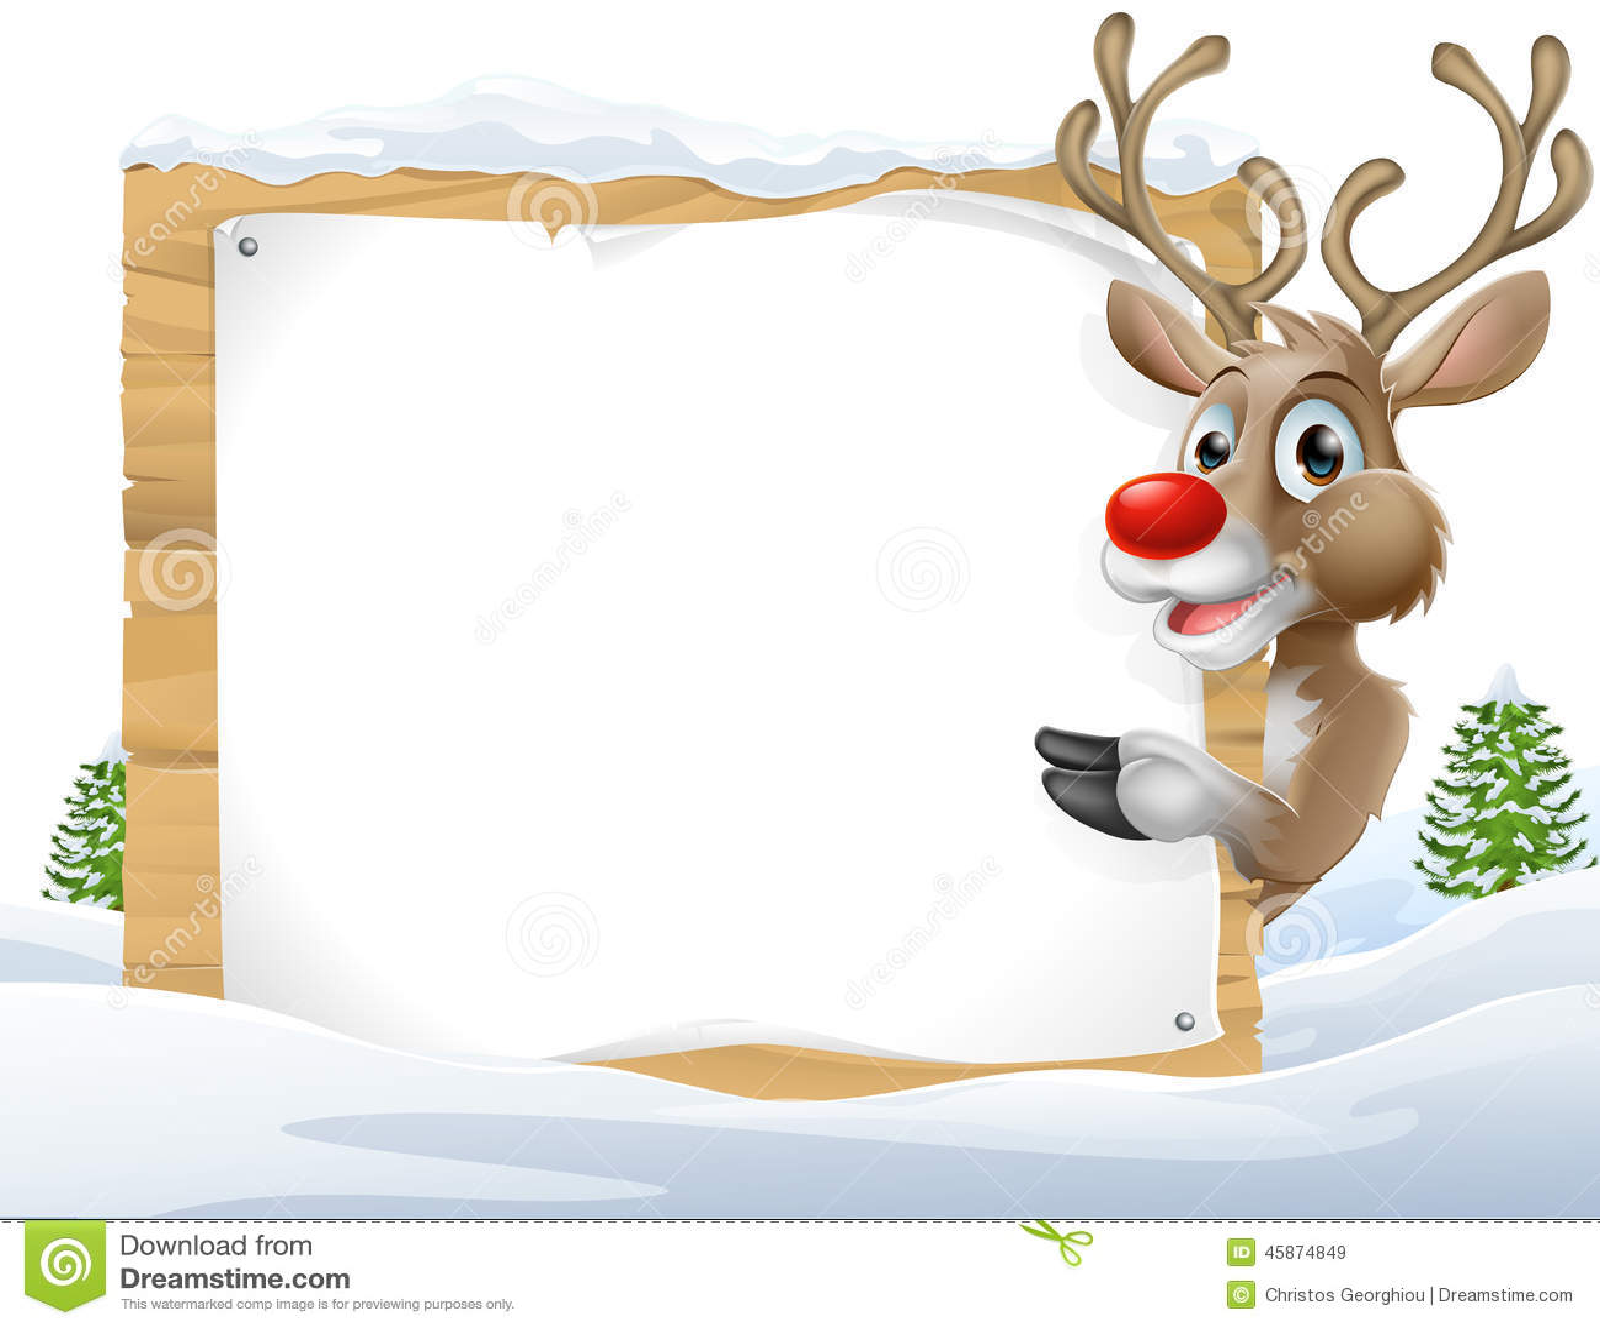 Christmas Reindeer Sign Stock Vector - Image: 45874849